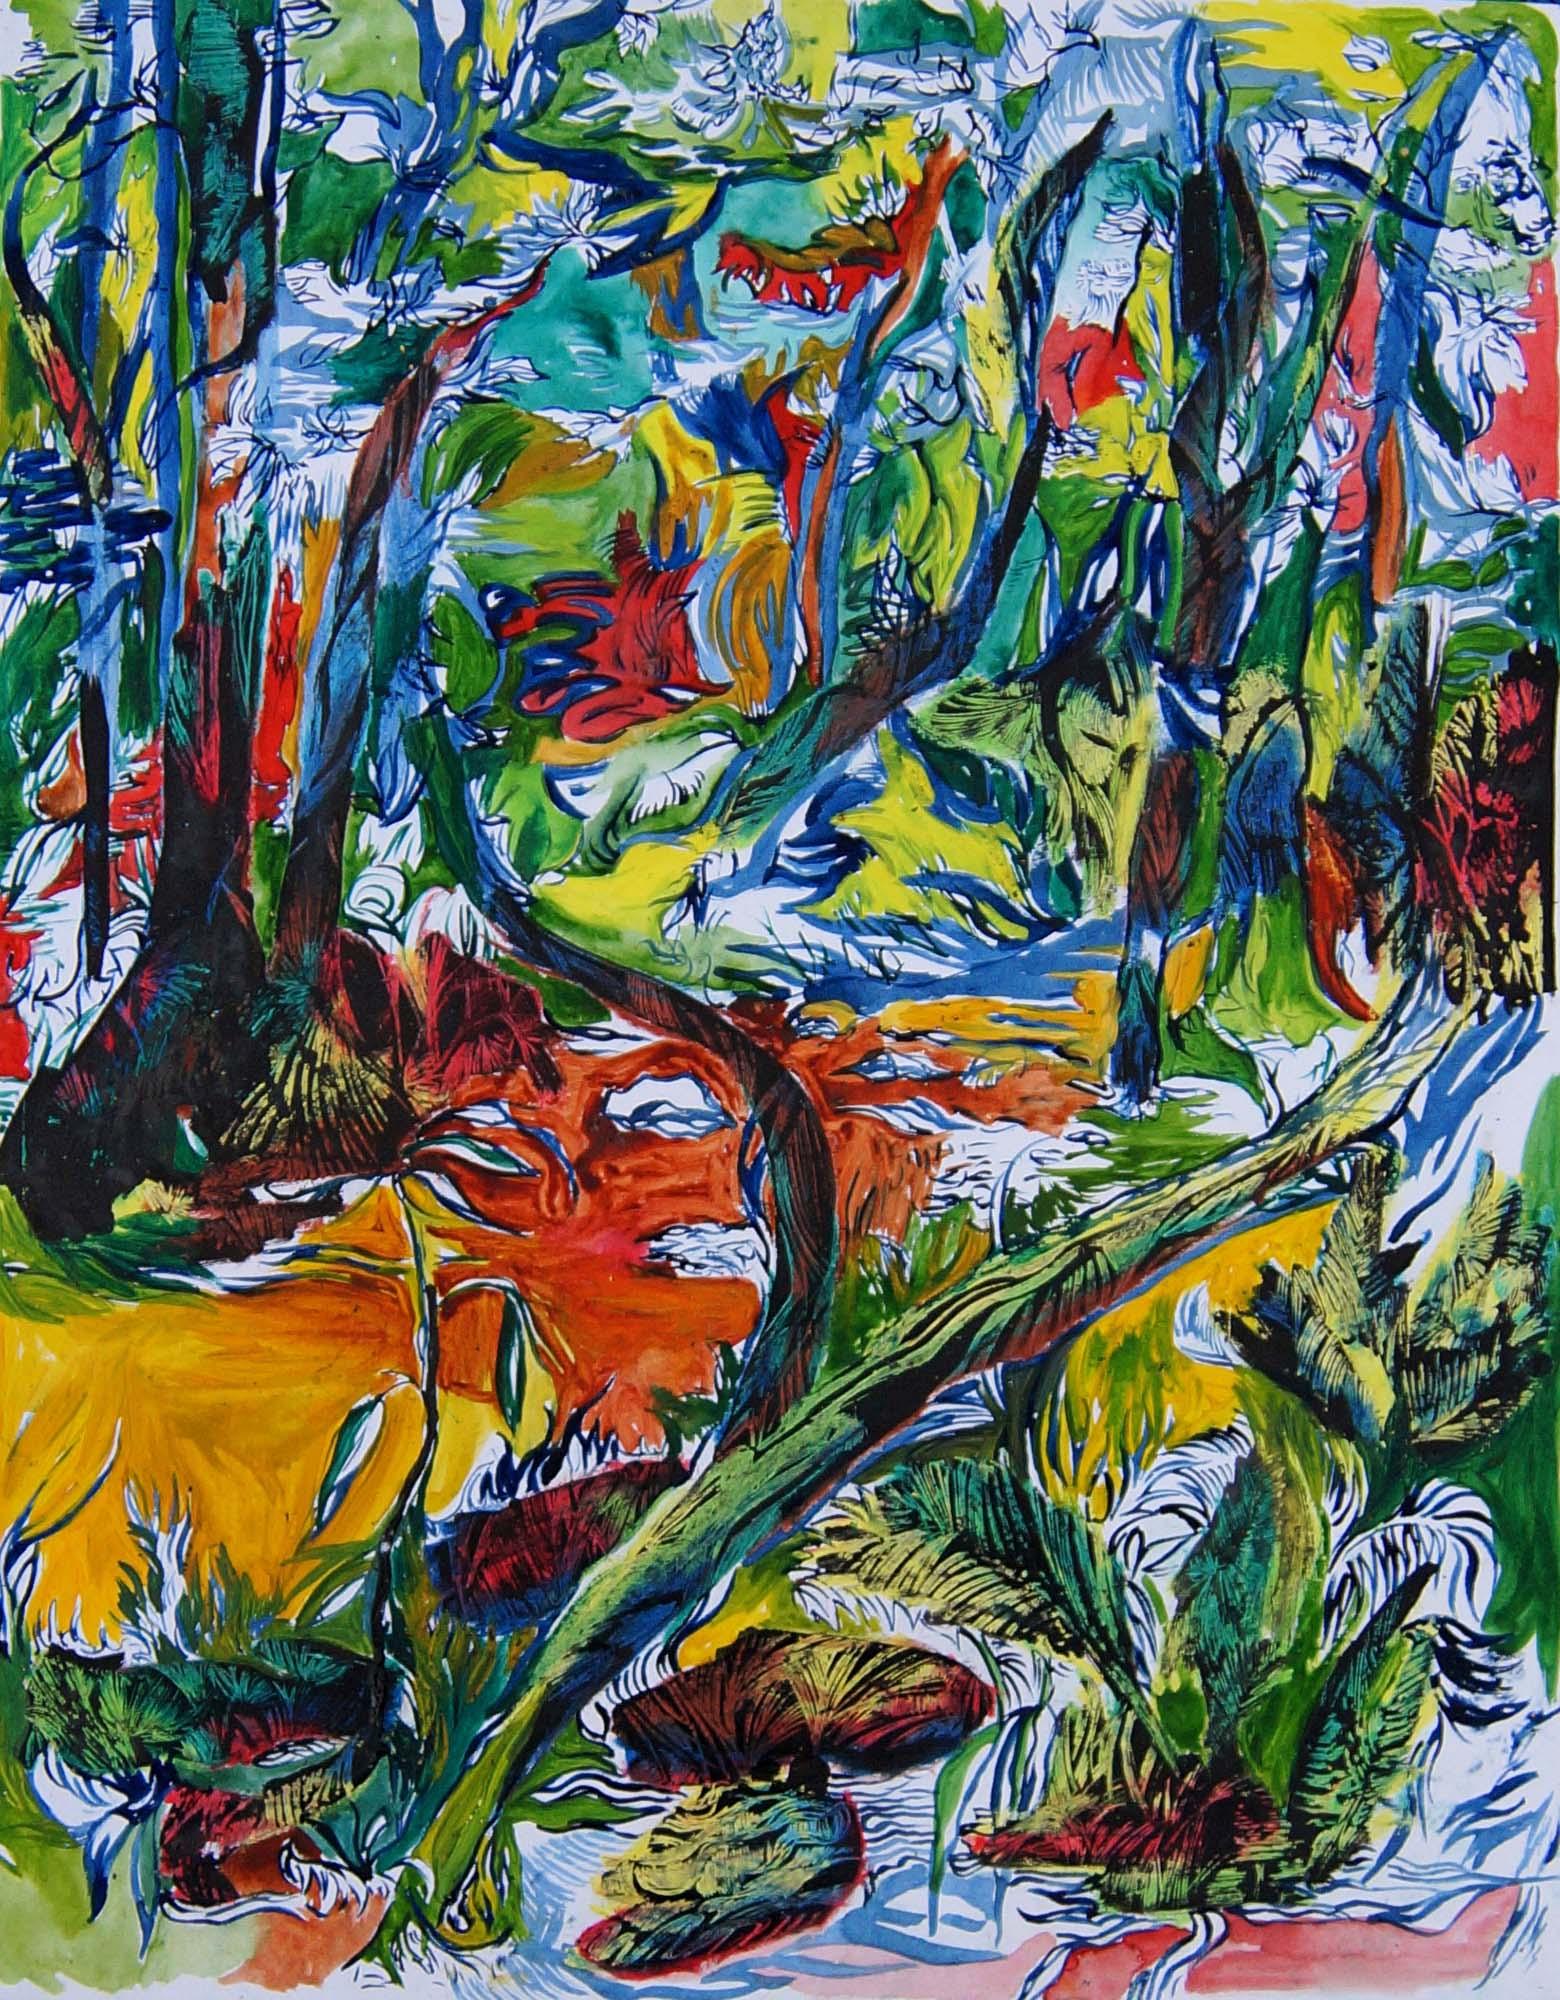 Barbora ChIastakova, Sacret forest 2, Mix media on handmade paper, 80 x 60 cm, 2016